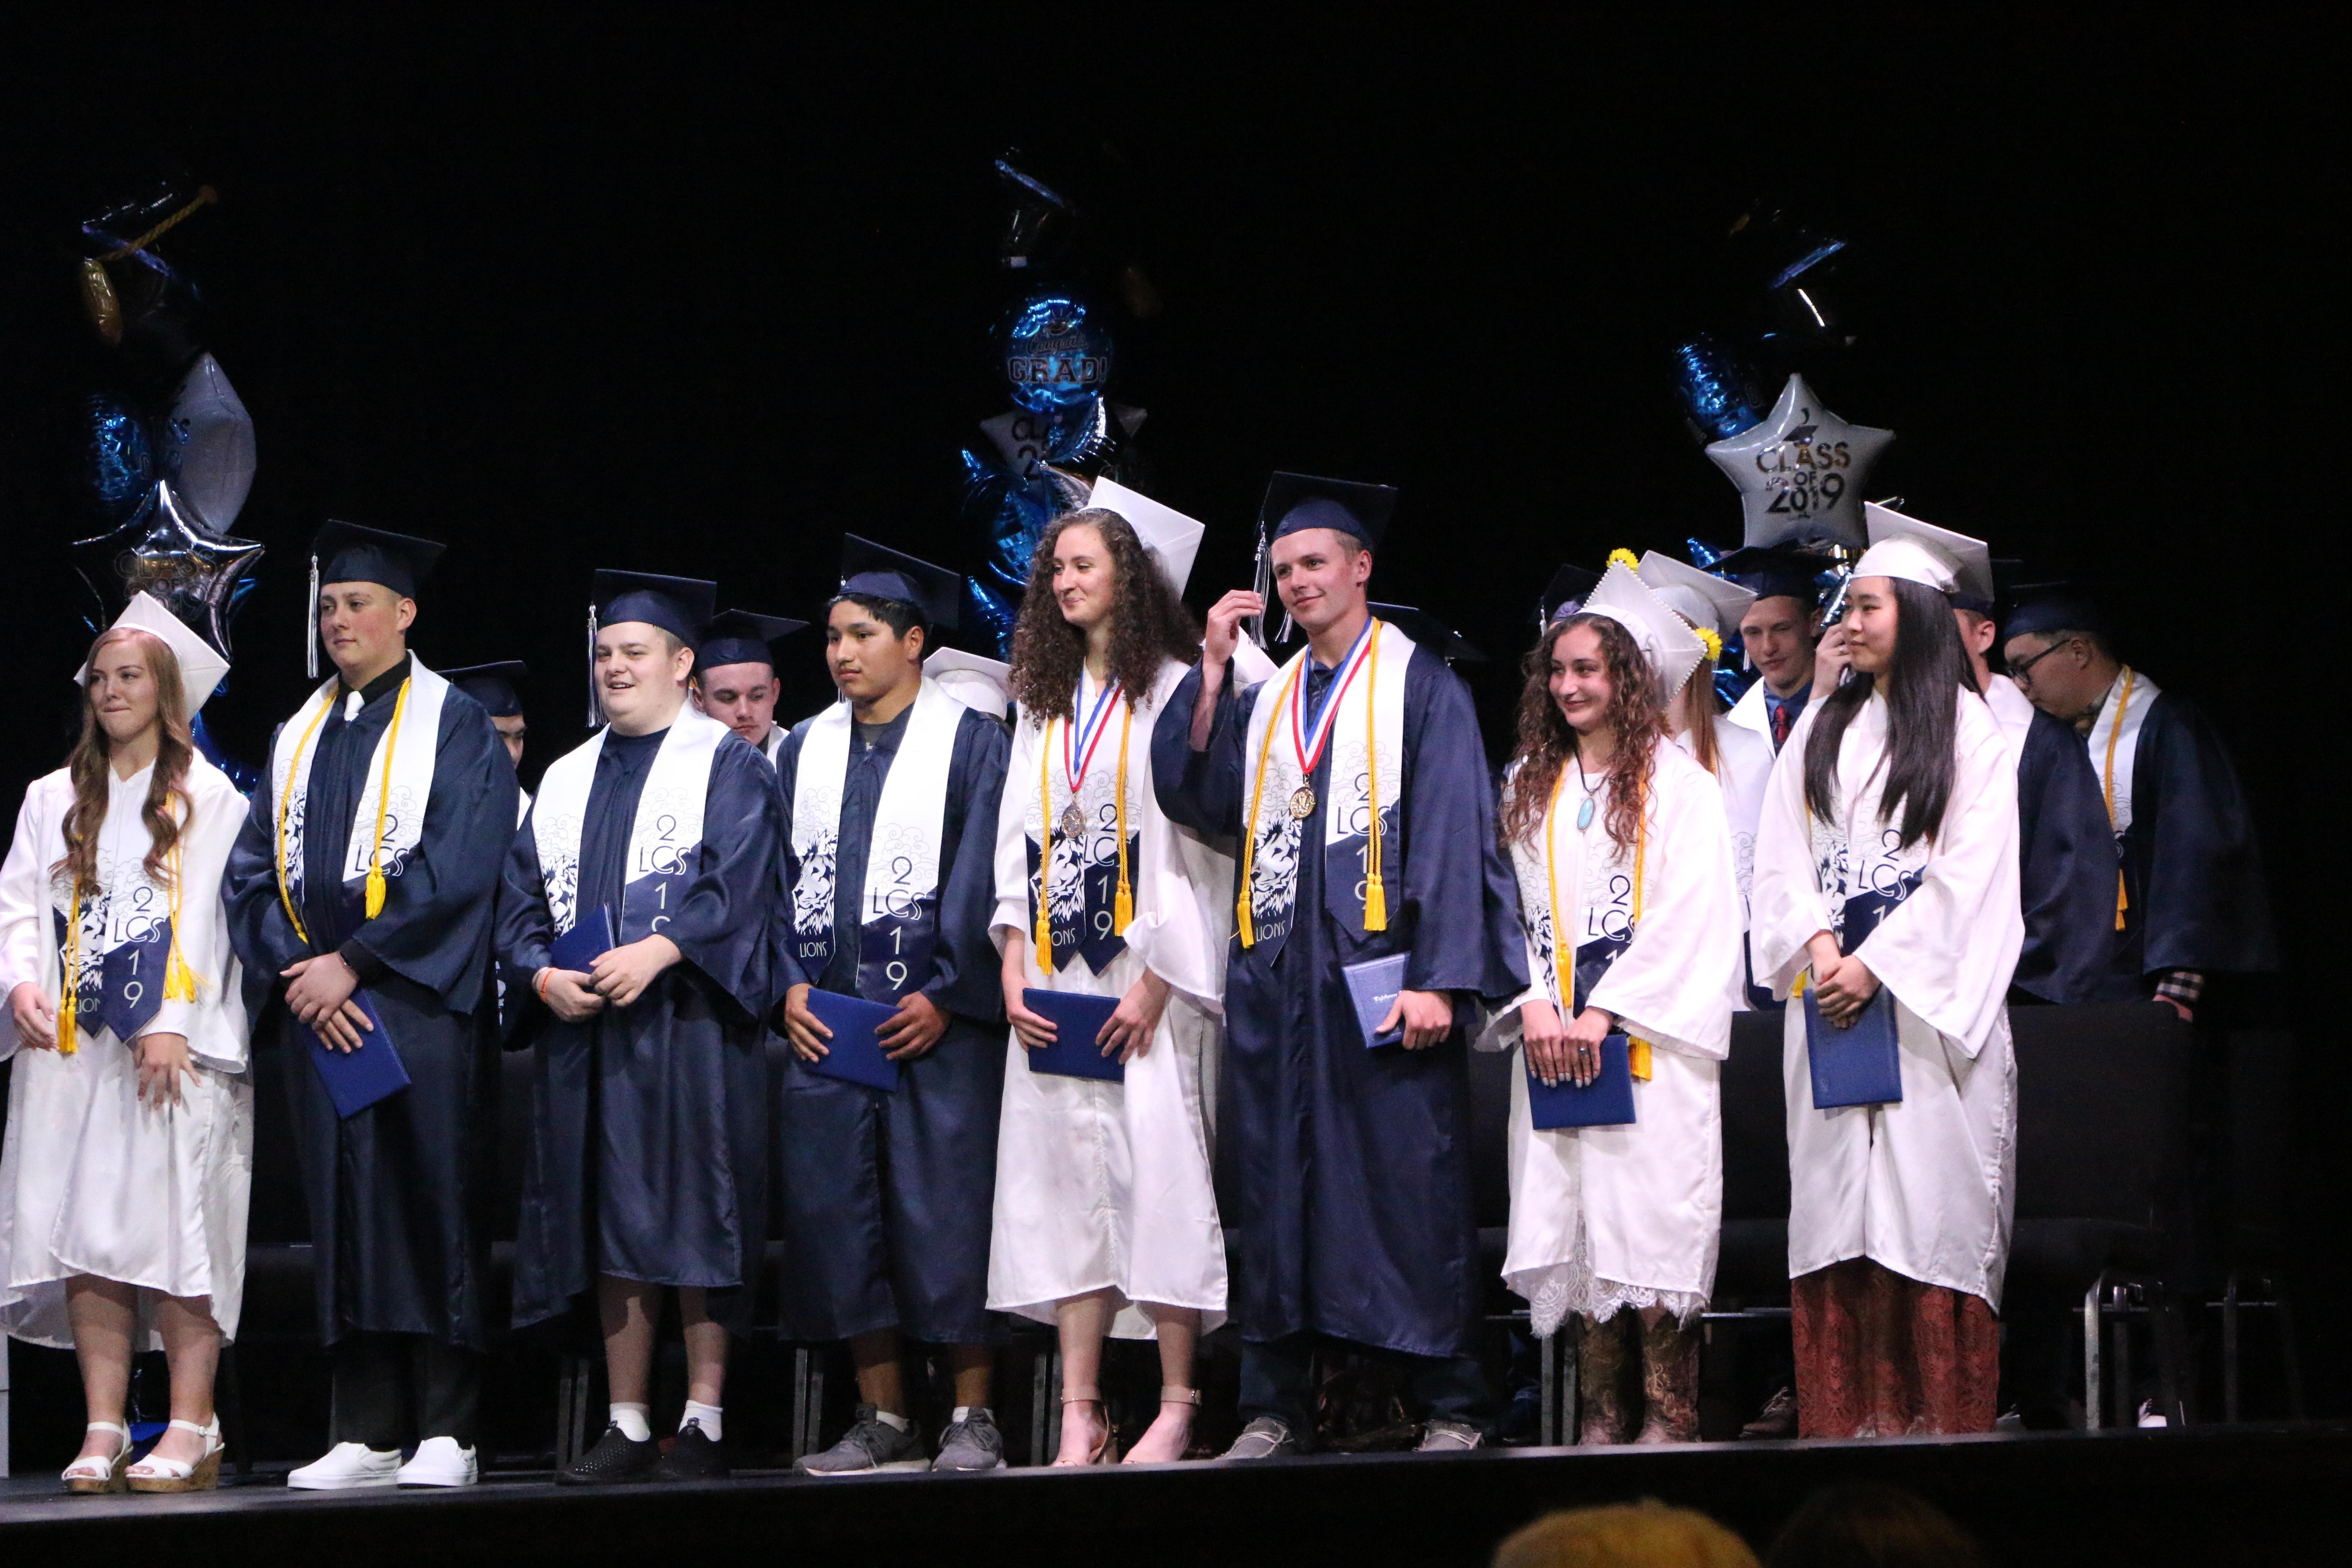 Graduation and Promotion Plans Image